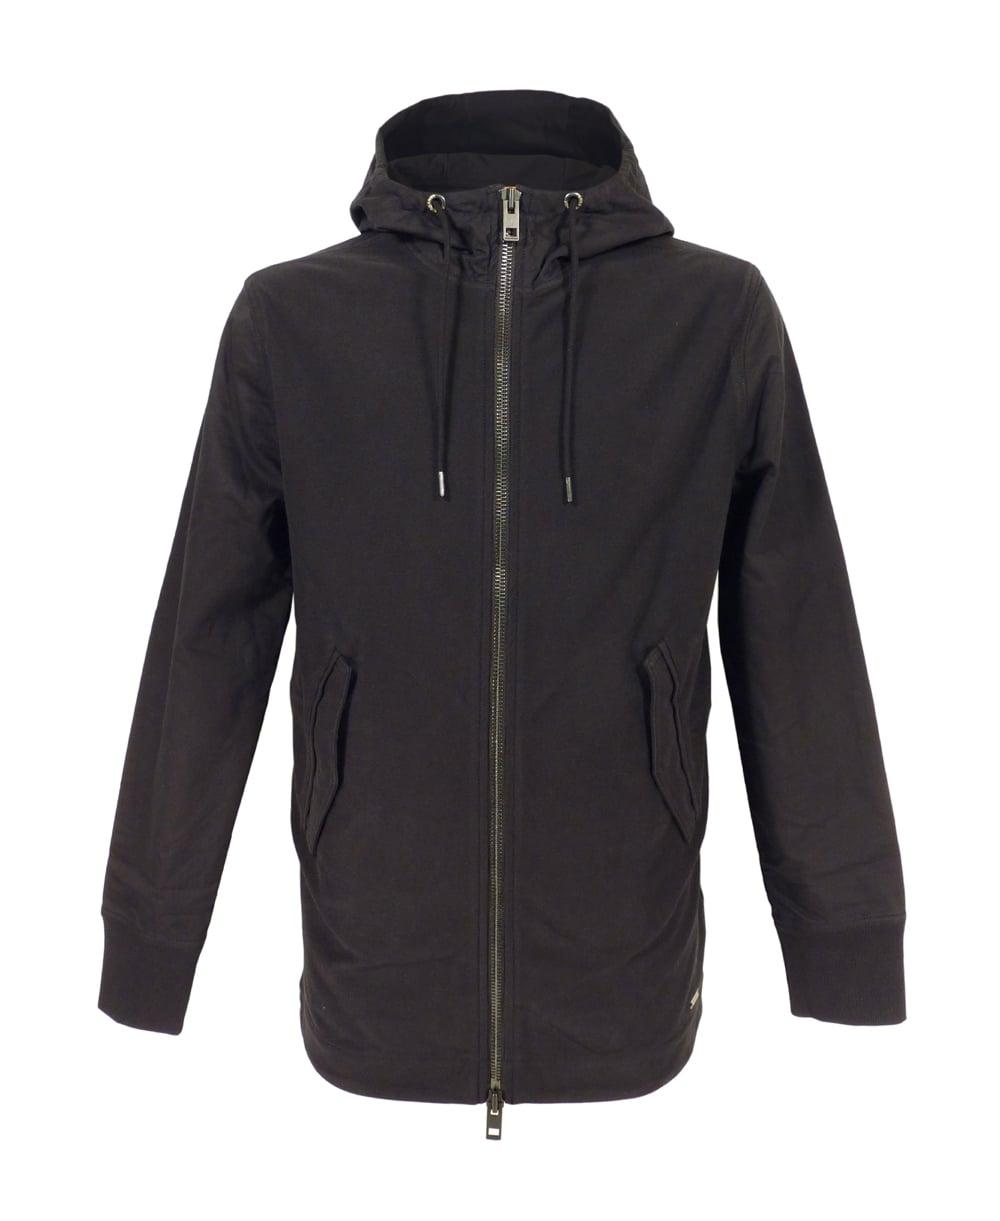 hugo boss 39 zoot 39 hooded sweatshirt in black hugo boss. Black Bedroom Furniture Sets. Home Design Ideas